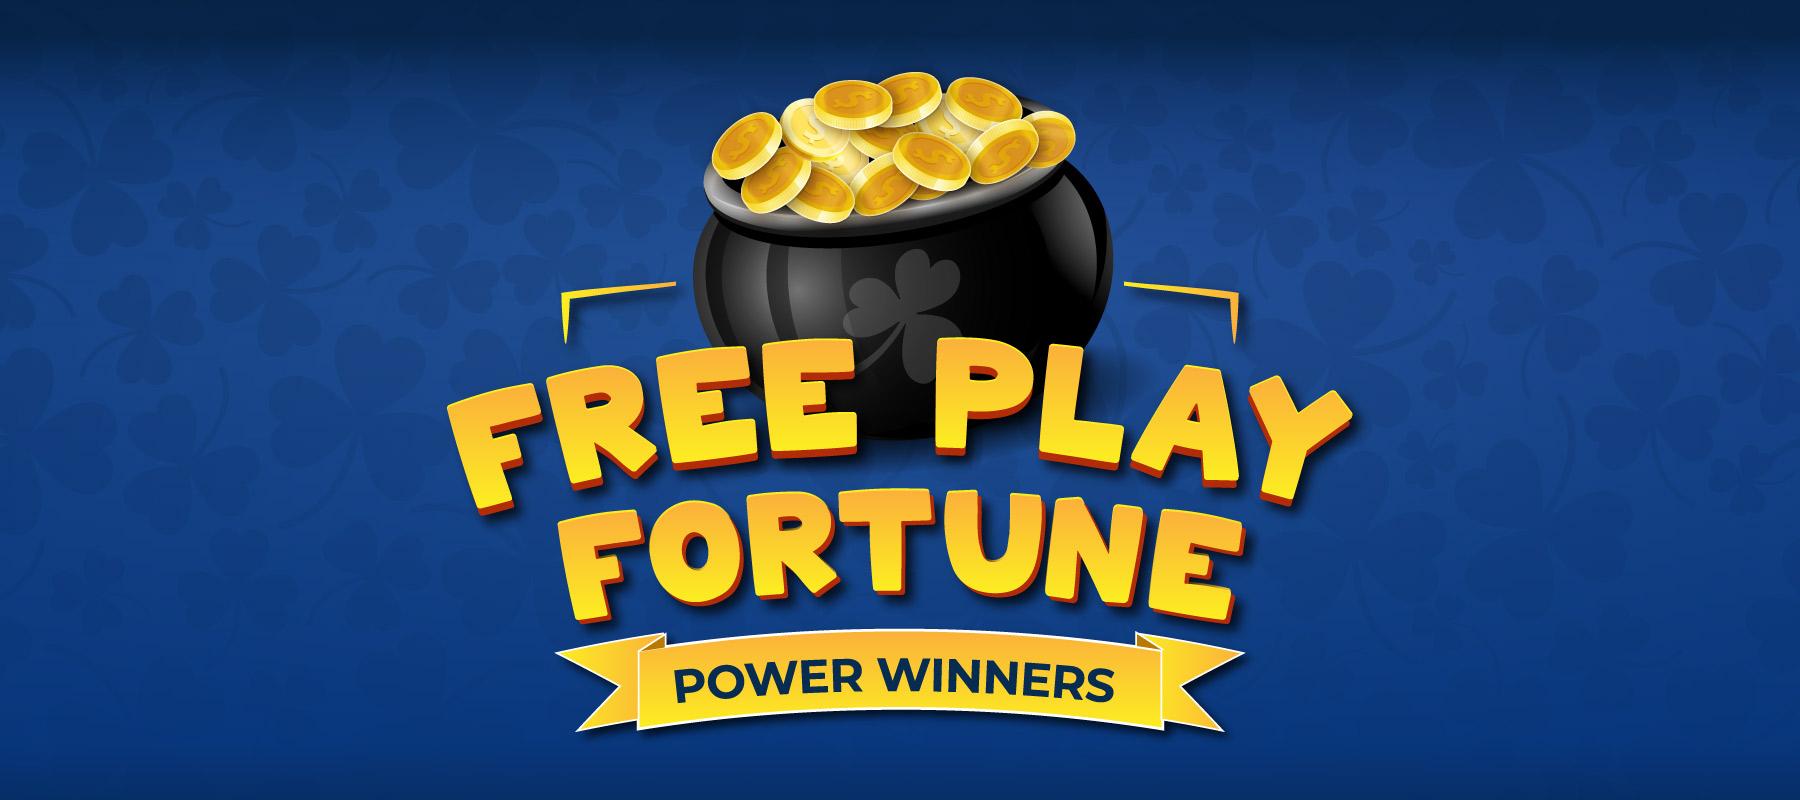 Free Play Fortune Power Winners